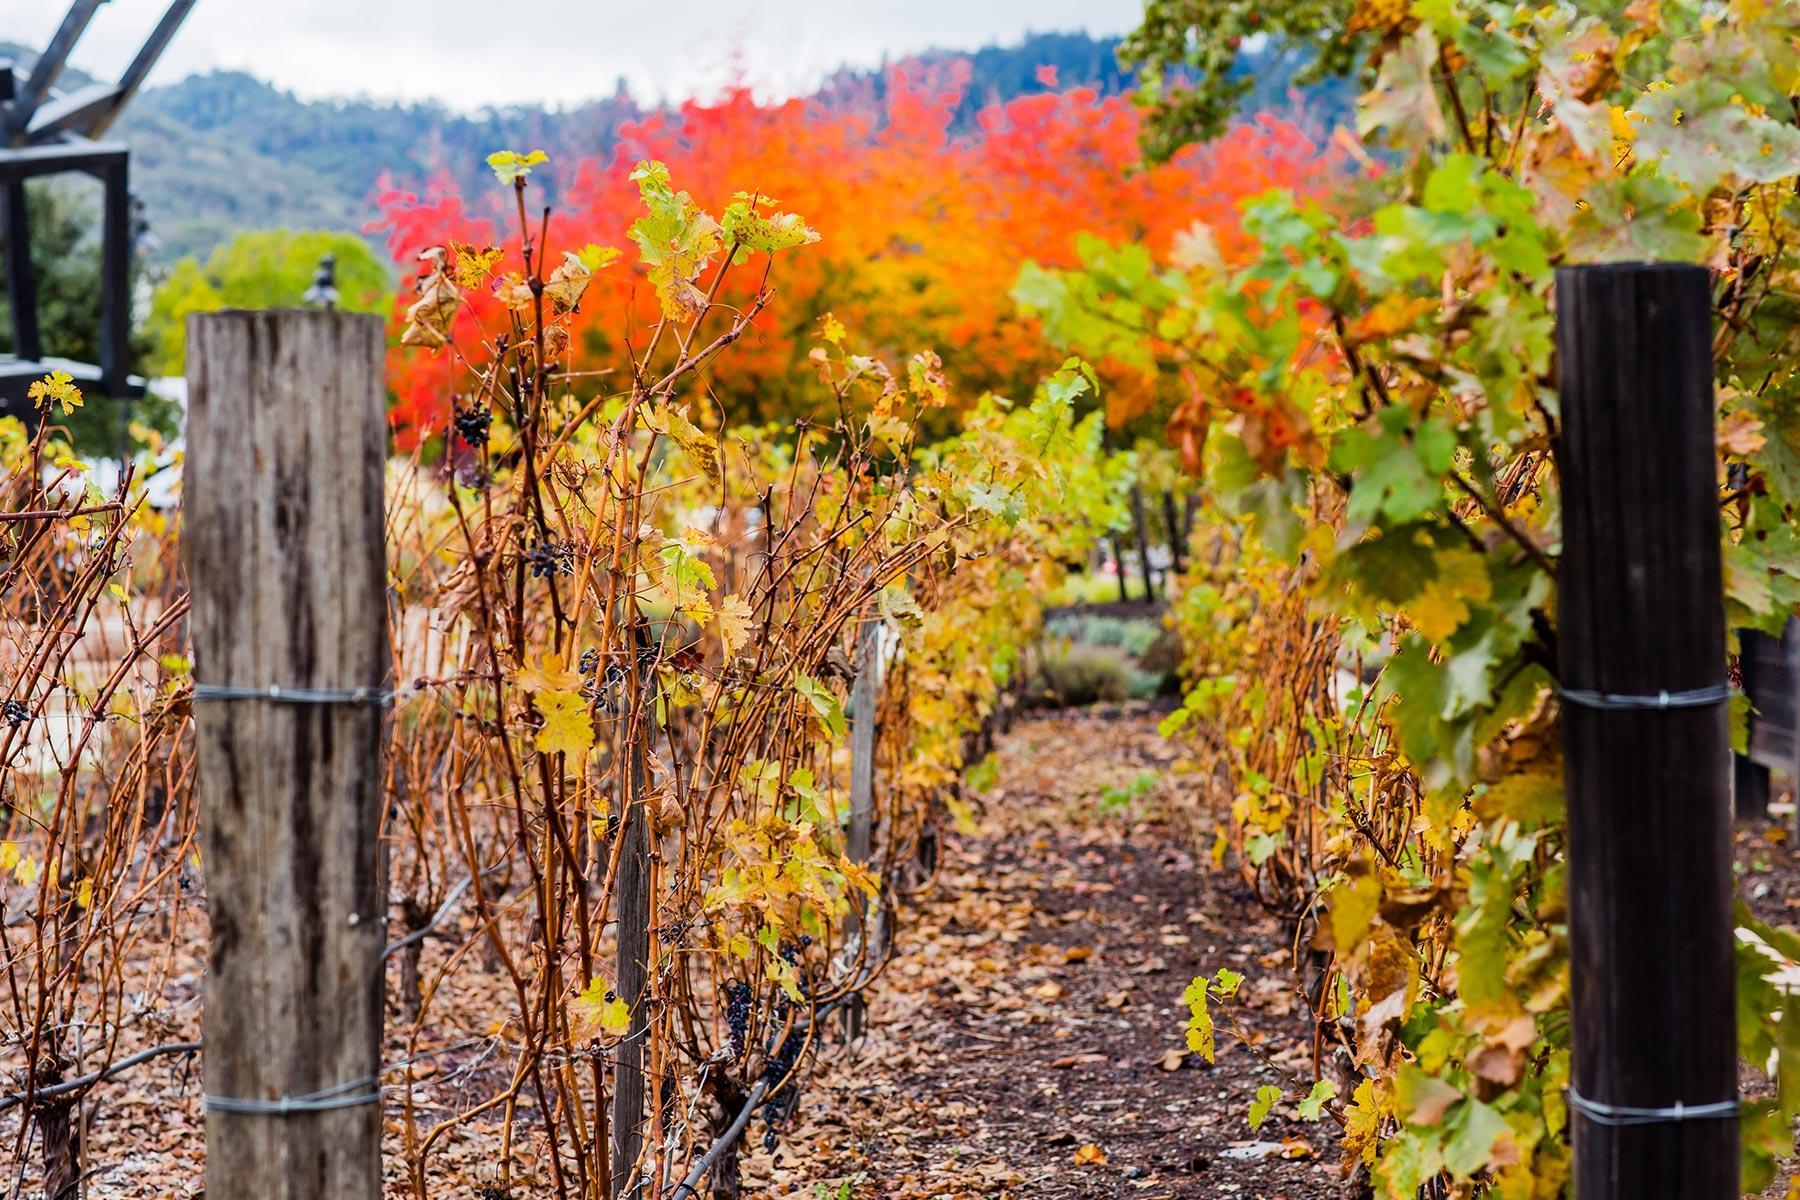 winery-1503242392626.jpg